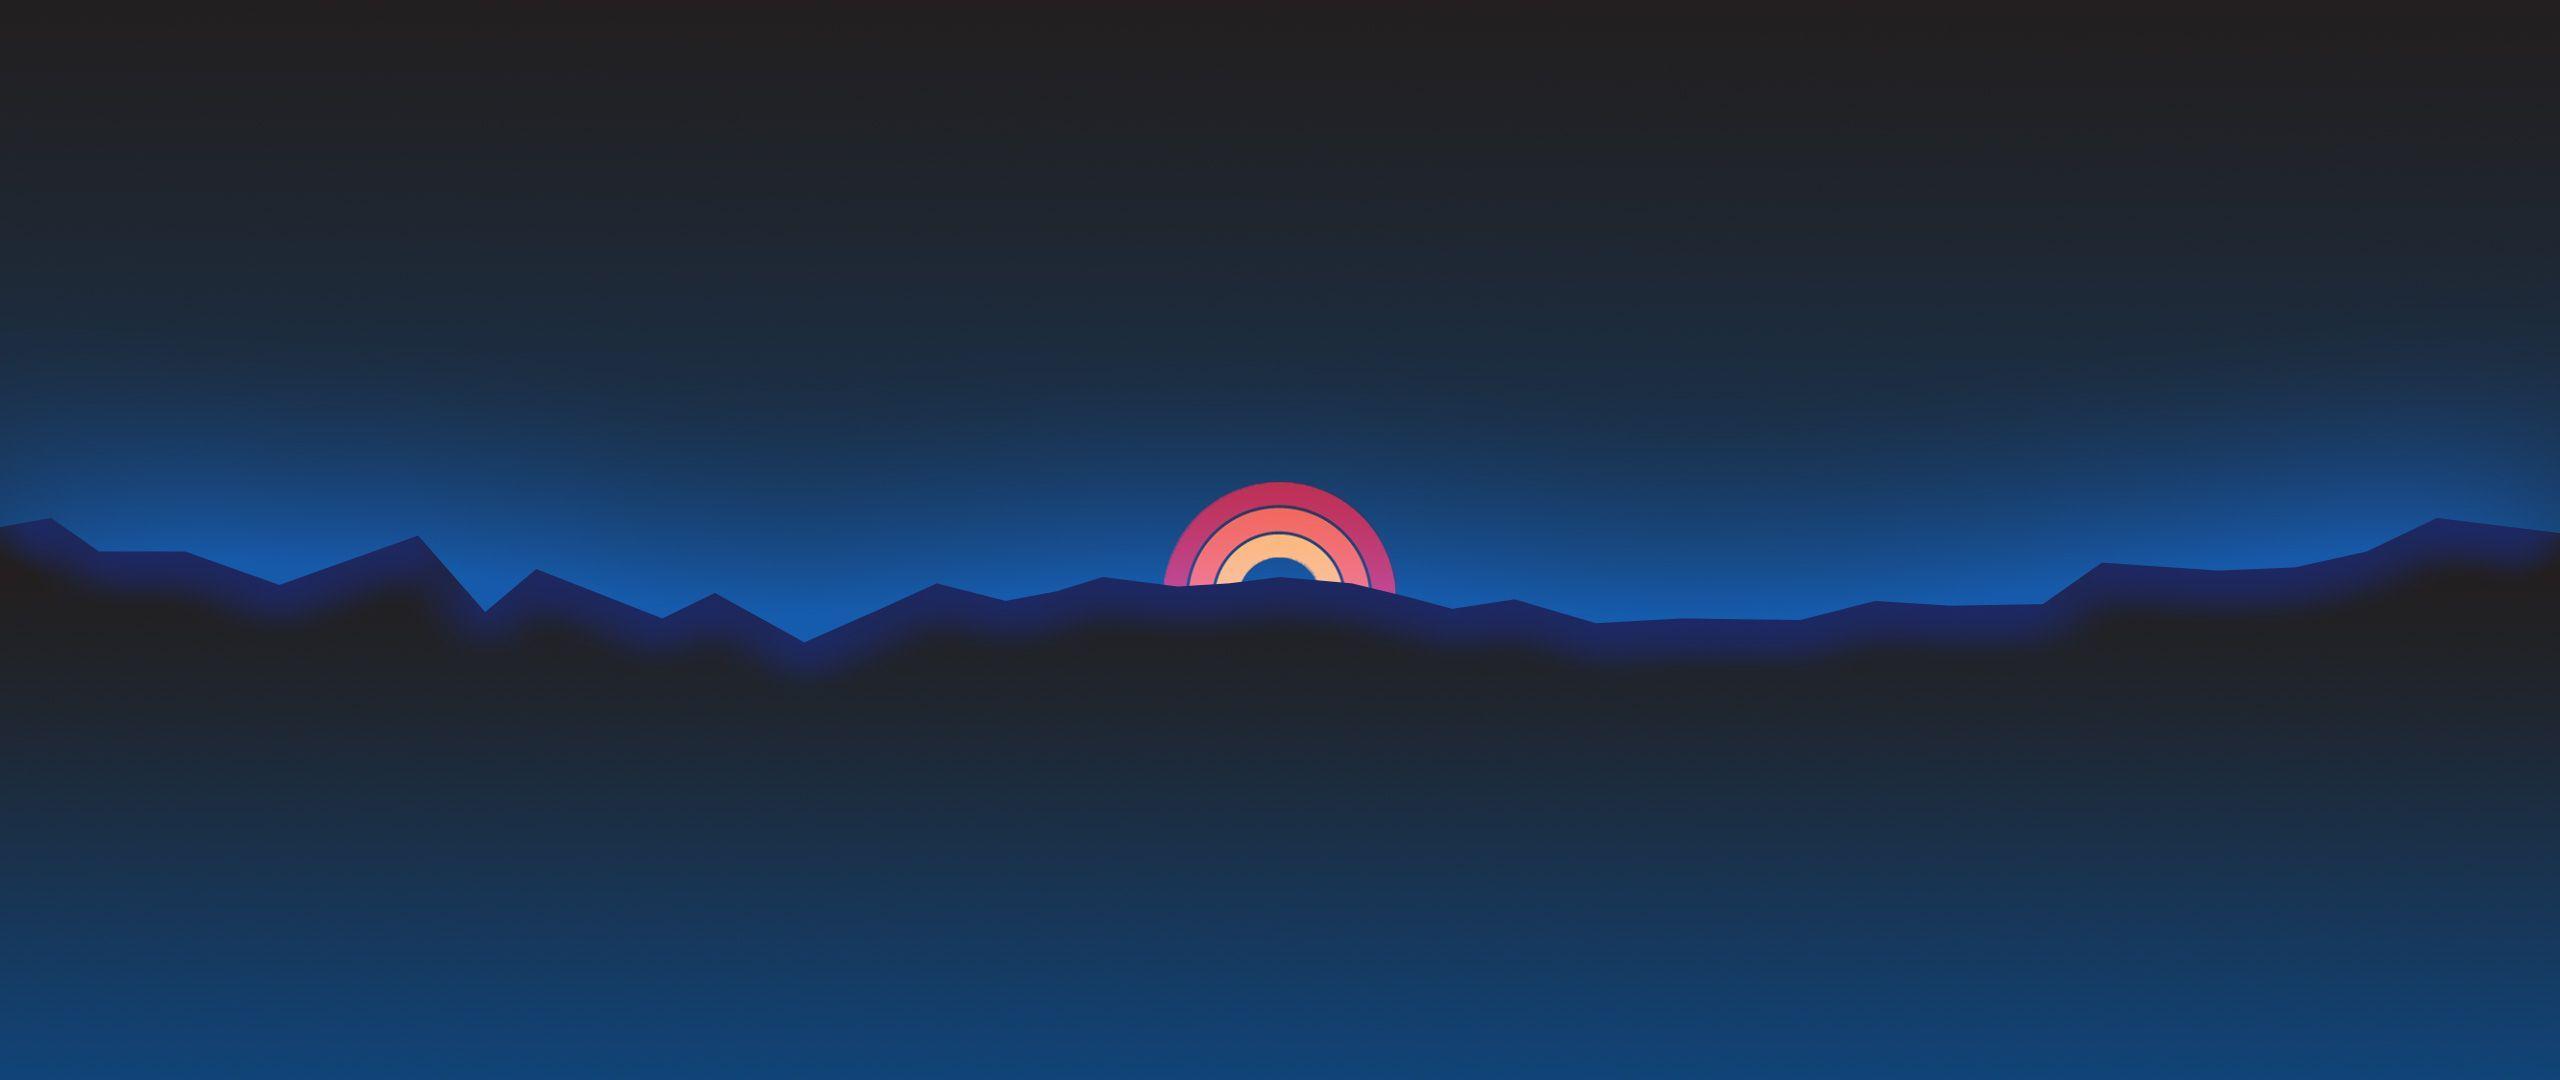 2560x1080 Minimalism Neon Rainbow Sunset Retro Style, HD Artist, 4k Wallpaper